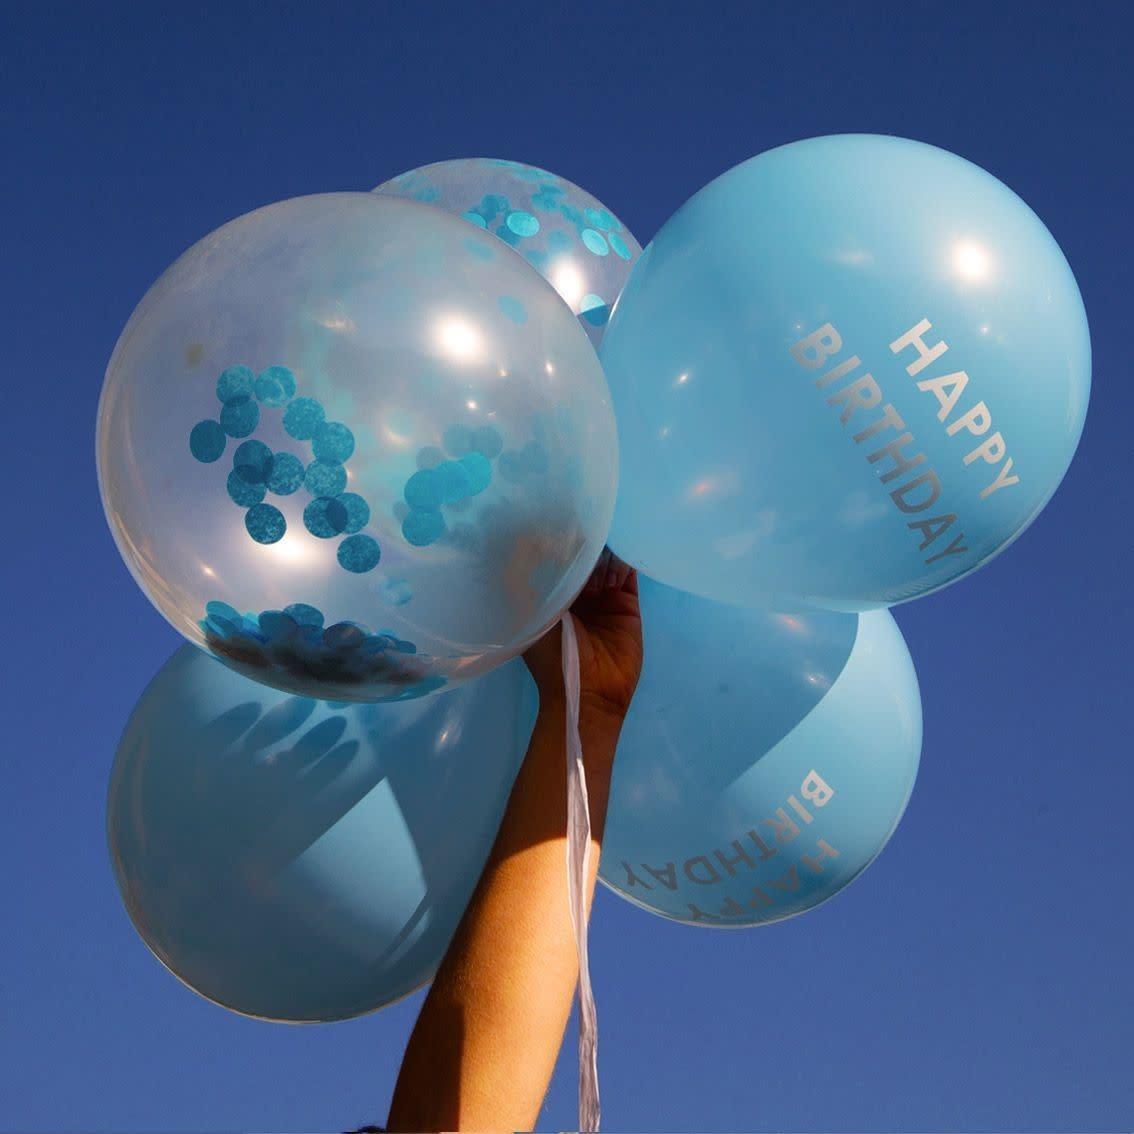 TT Blue Happy Birthday Confetti Balloons